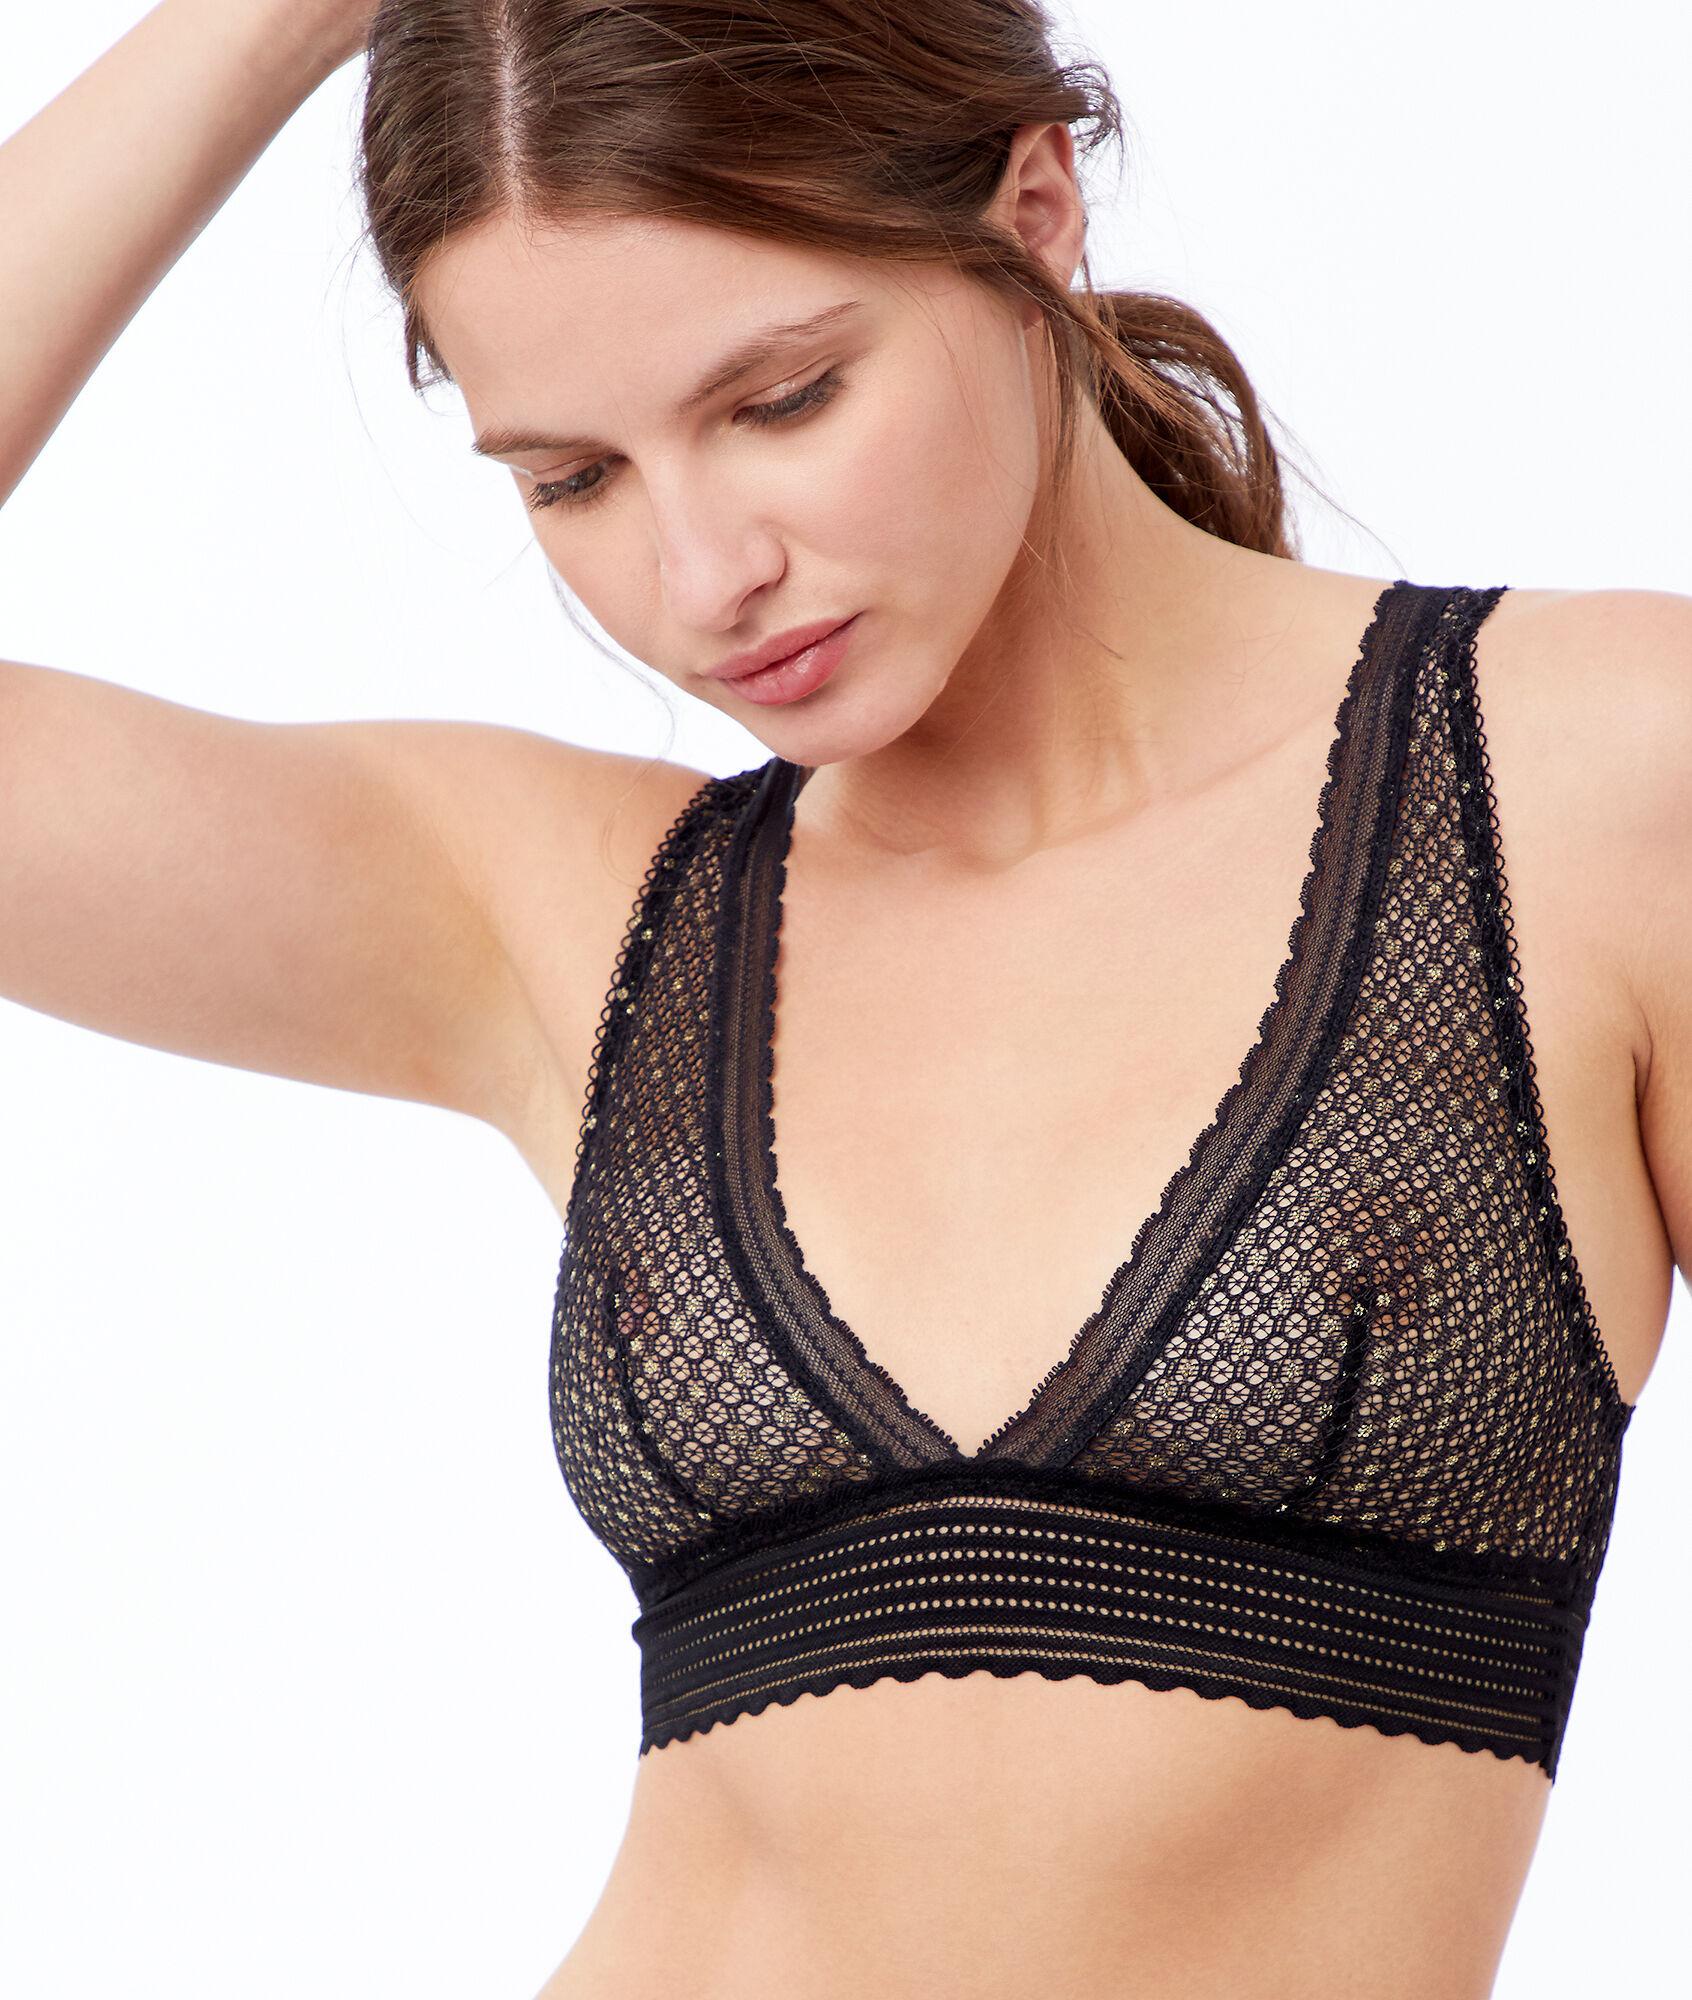 c09336a438 Fishnet bra and metallic fibers - Etam